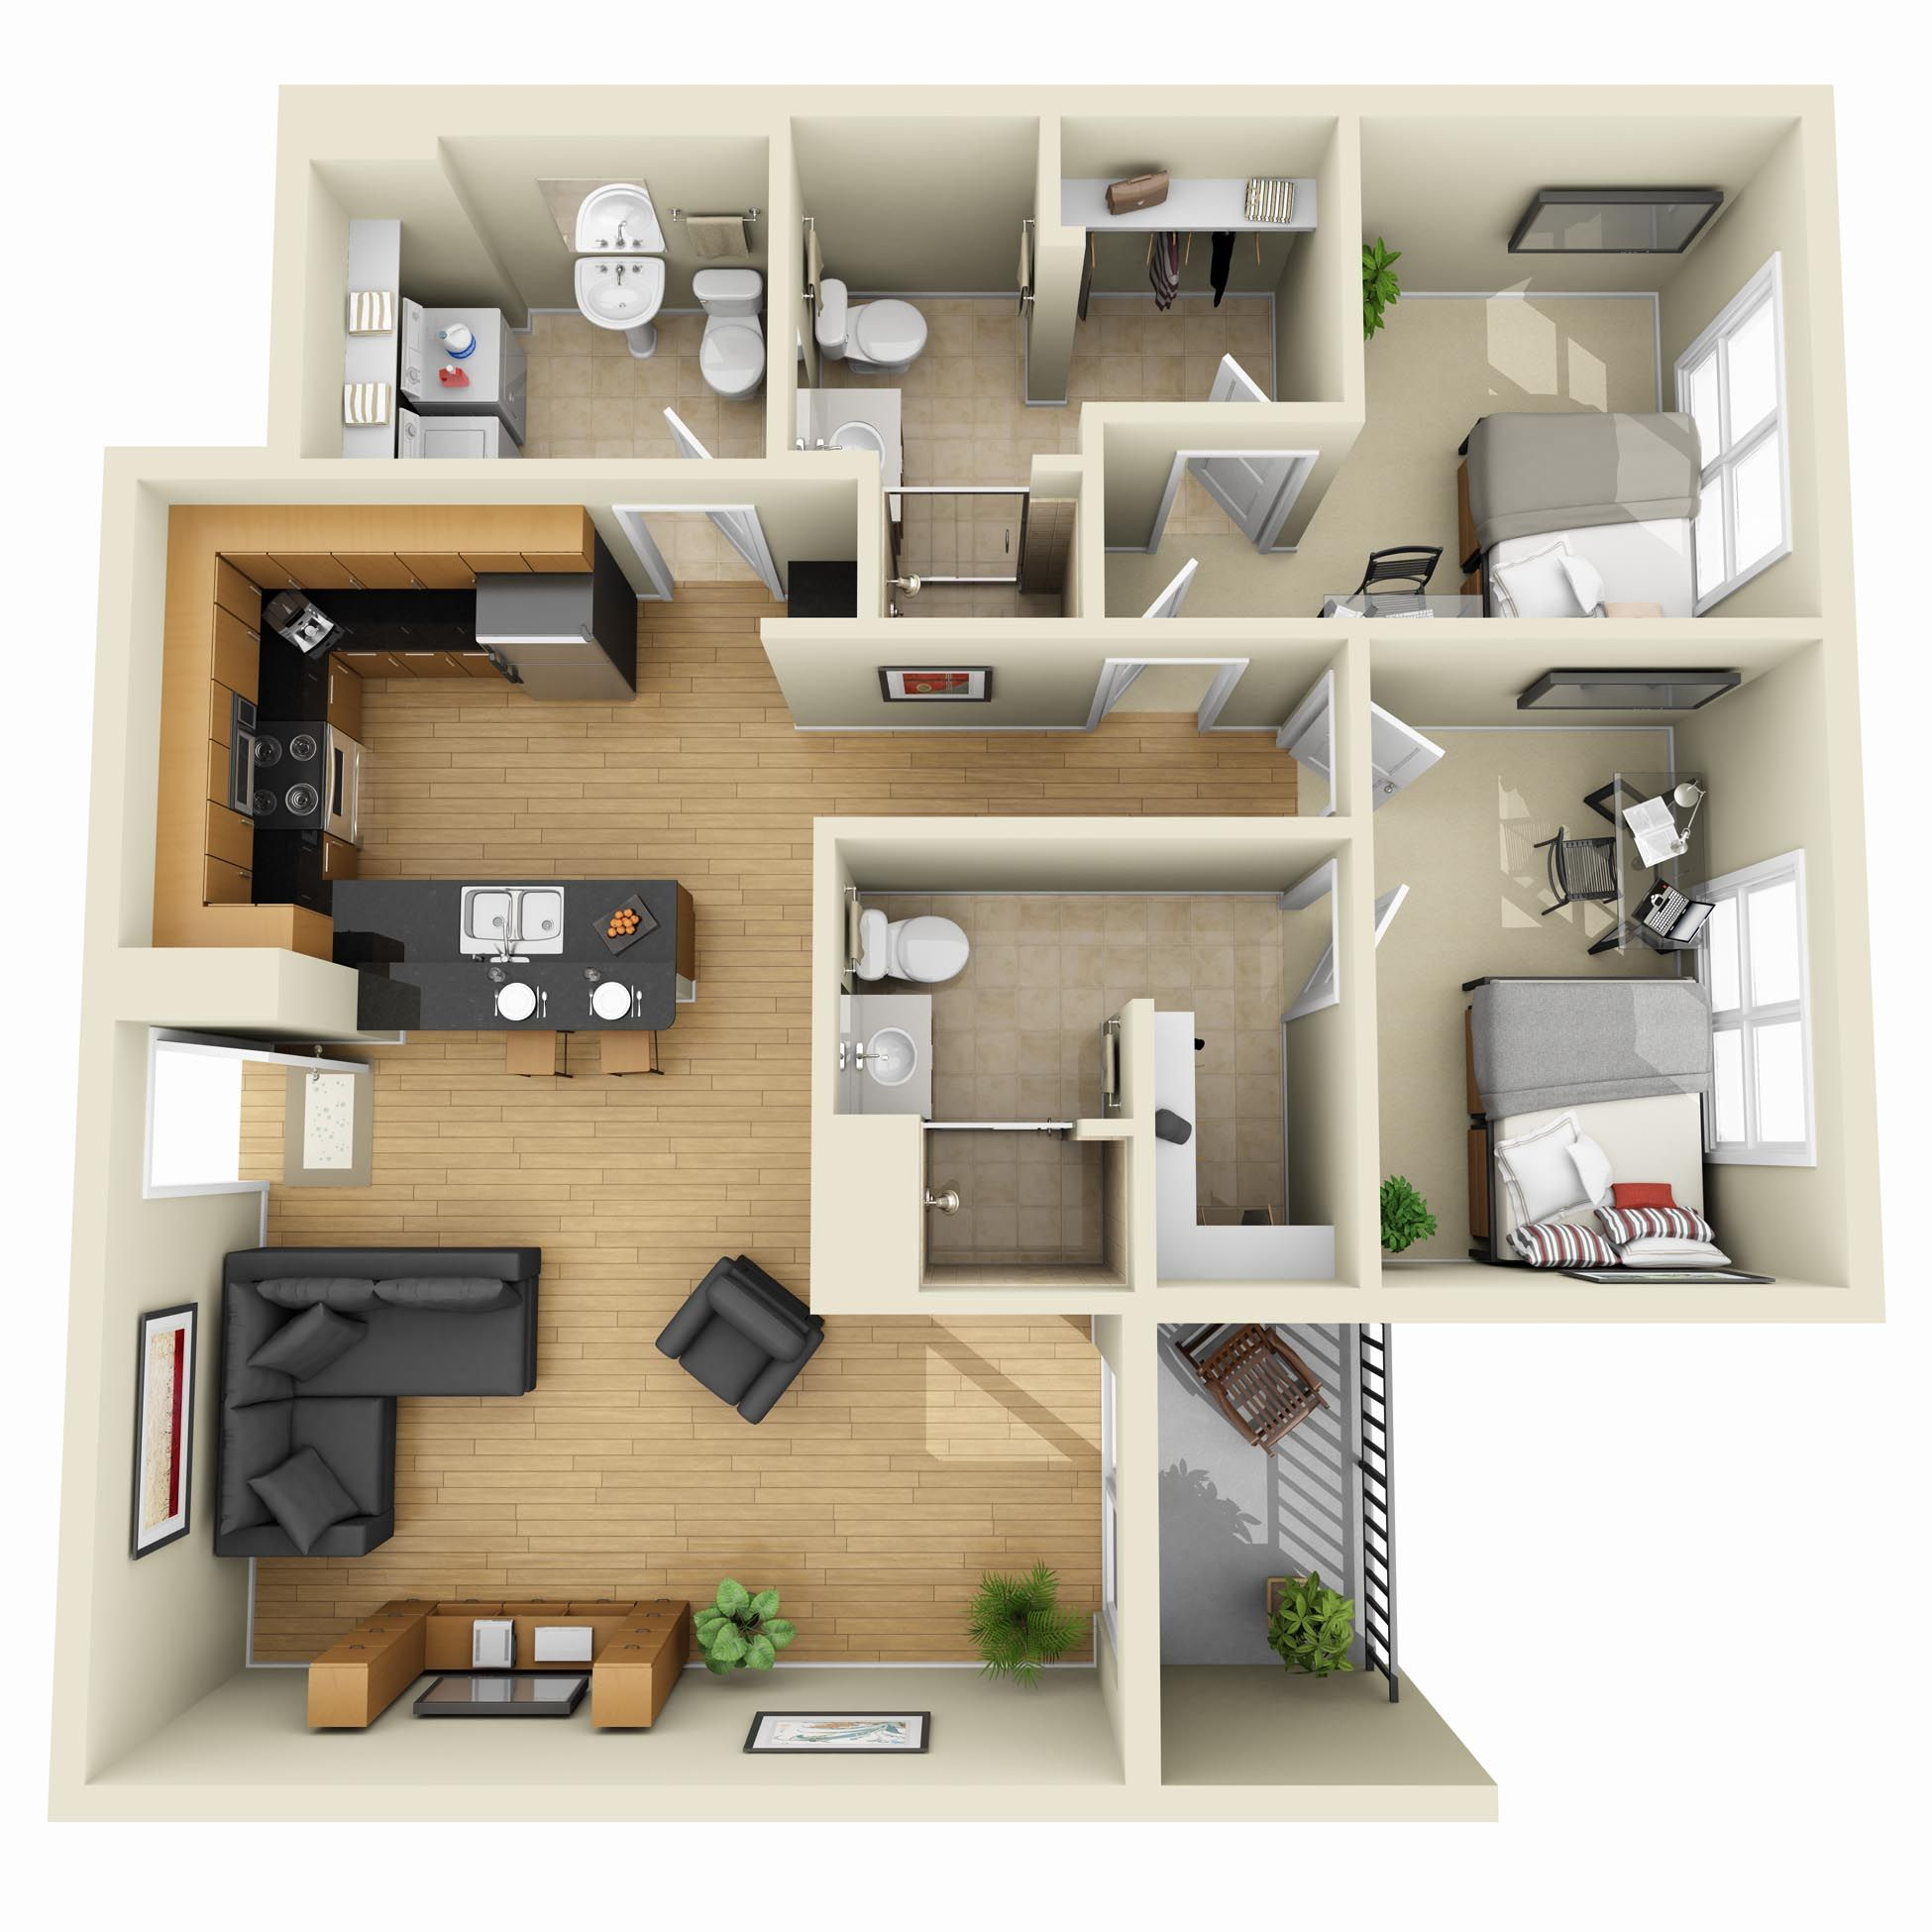 Spectacular d floor plan apartment Google Search